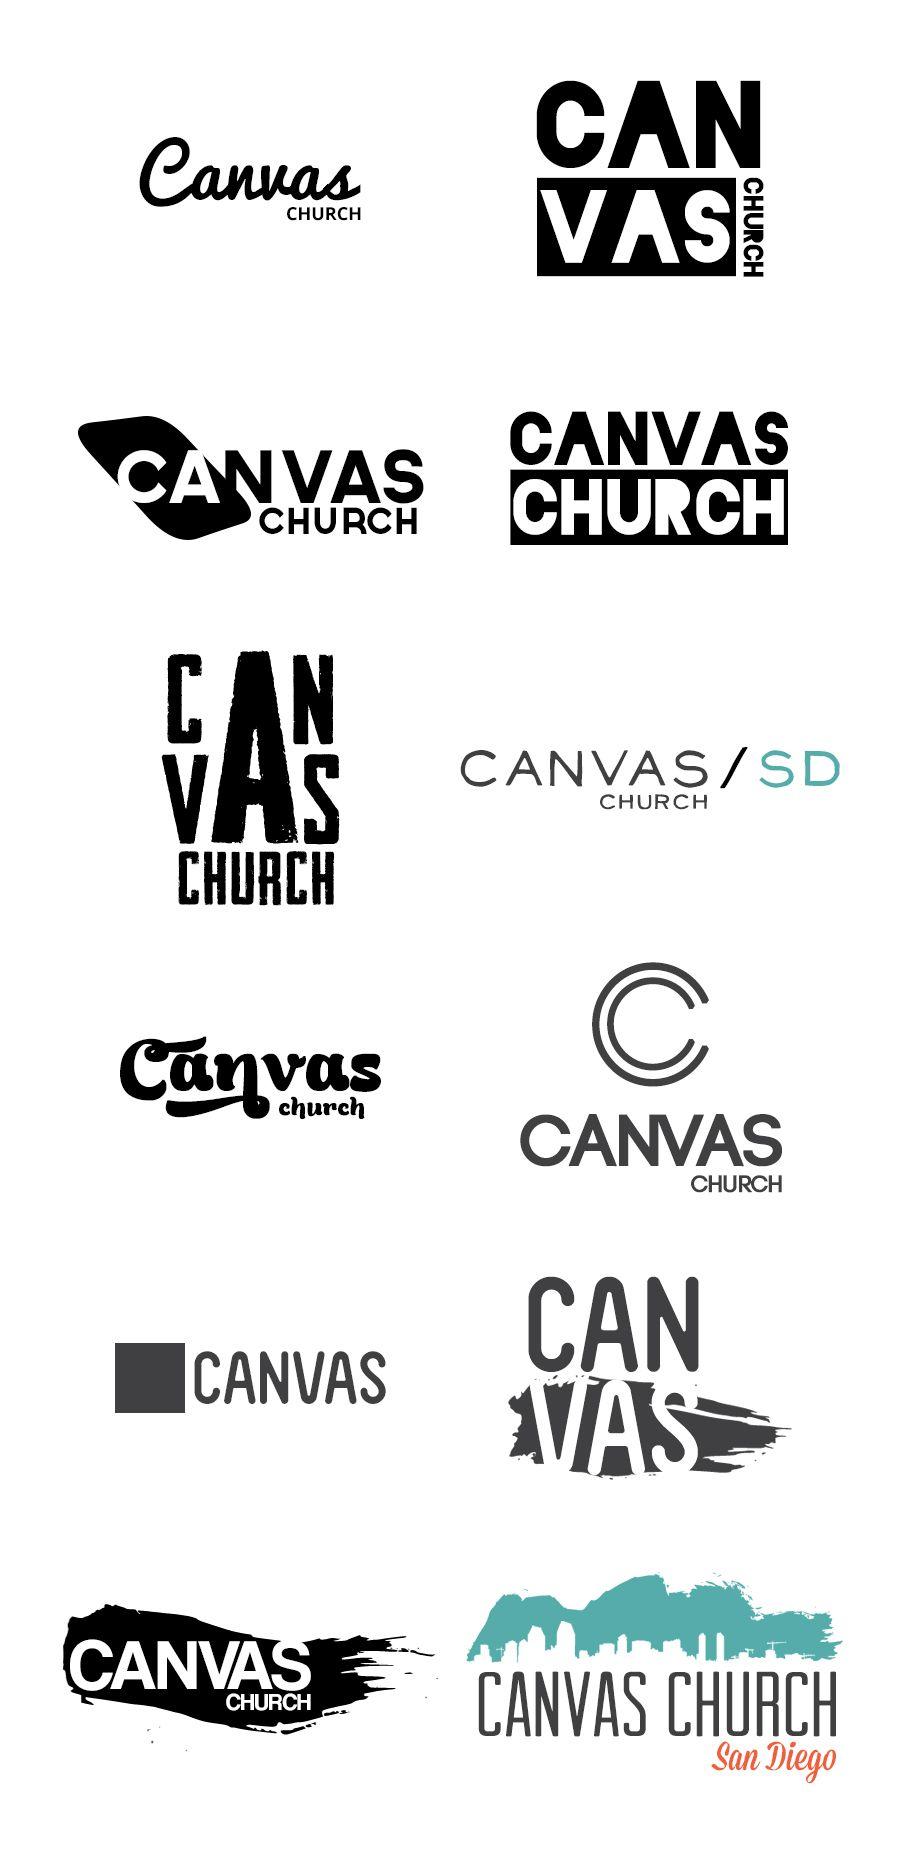 Canvas Church logo ideas by